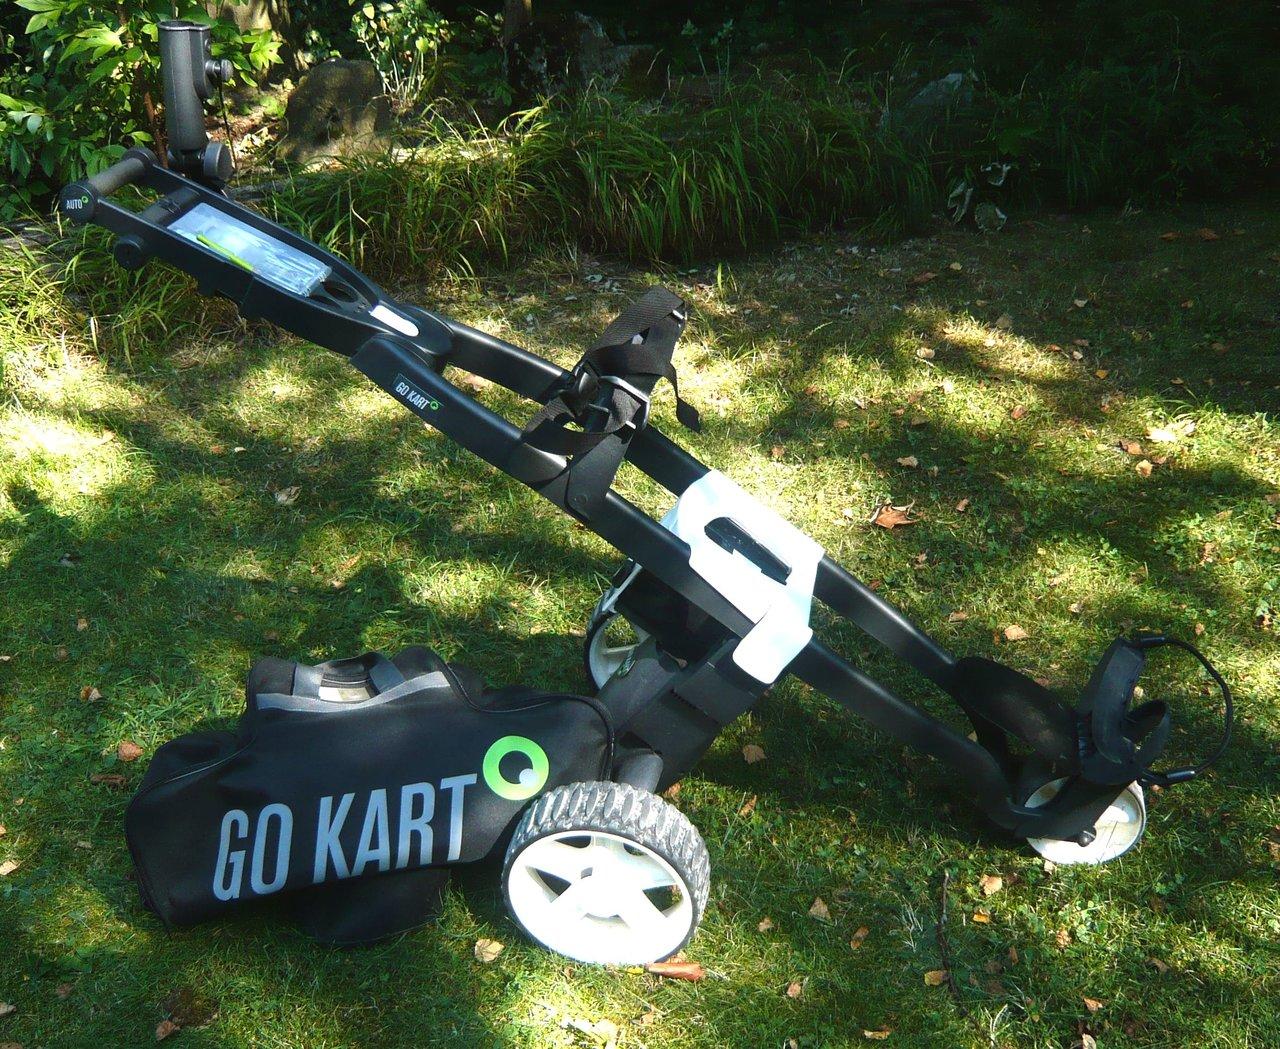 gokart automatic golf elektrotrolley caddy golfwagen. Black Bedroom Furniture Sets. Home Design Ideas